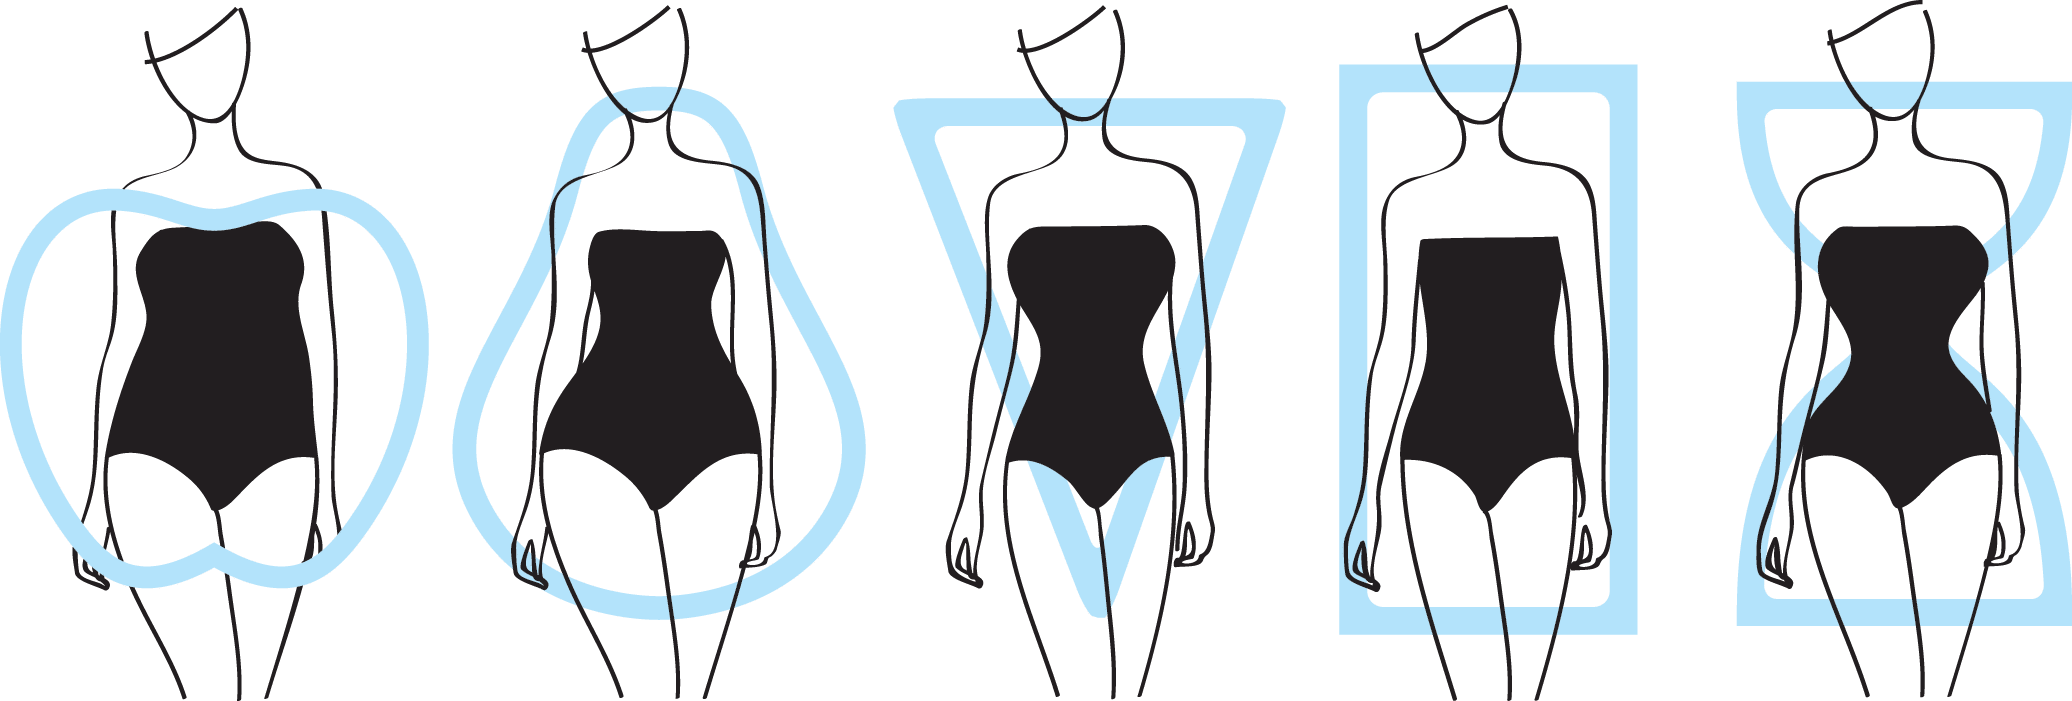 5 Body Shapes